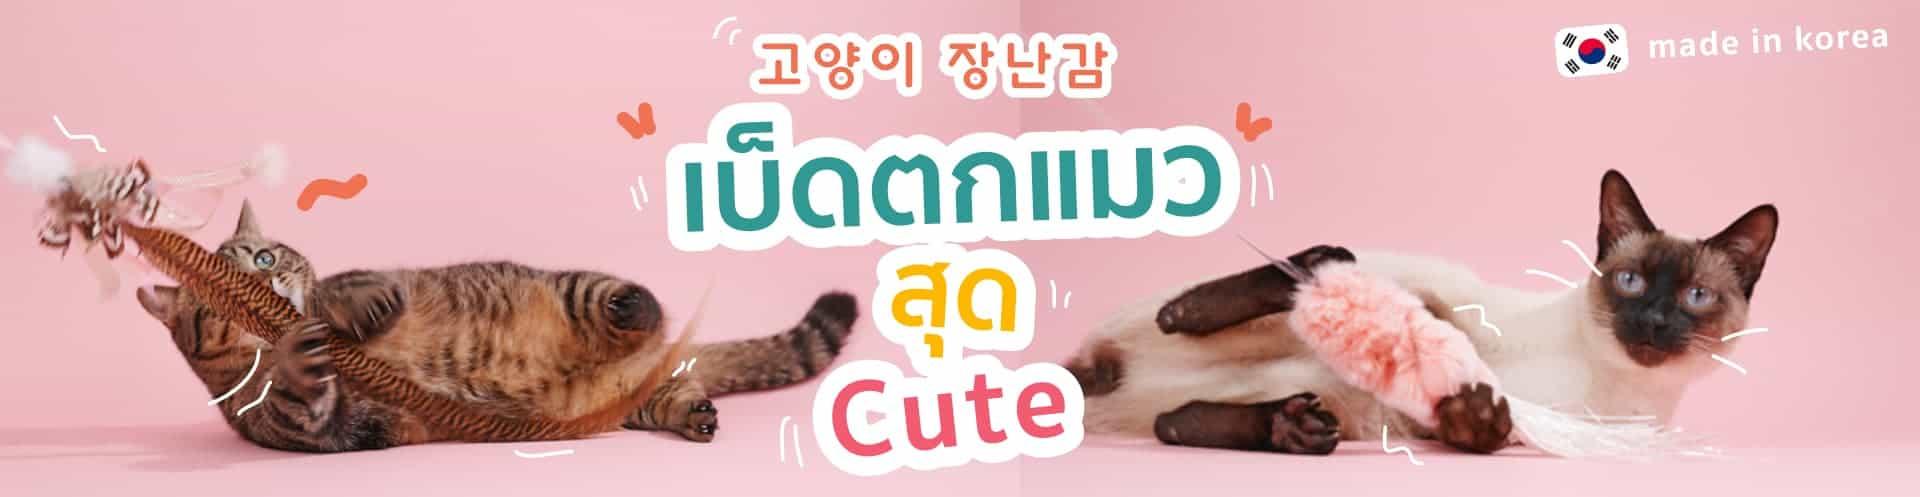 Cat toys Main